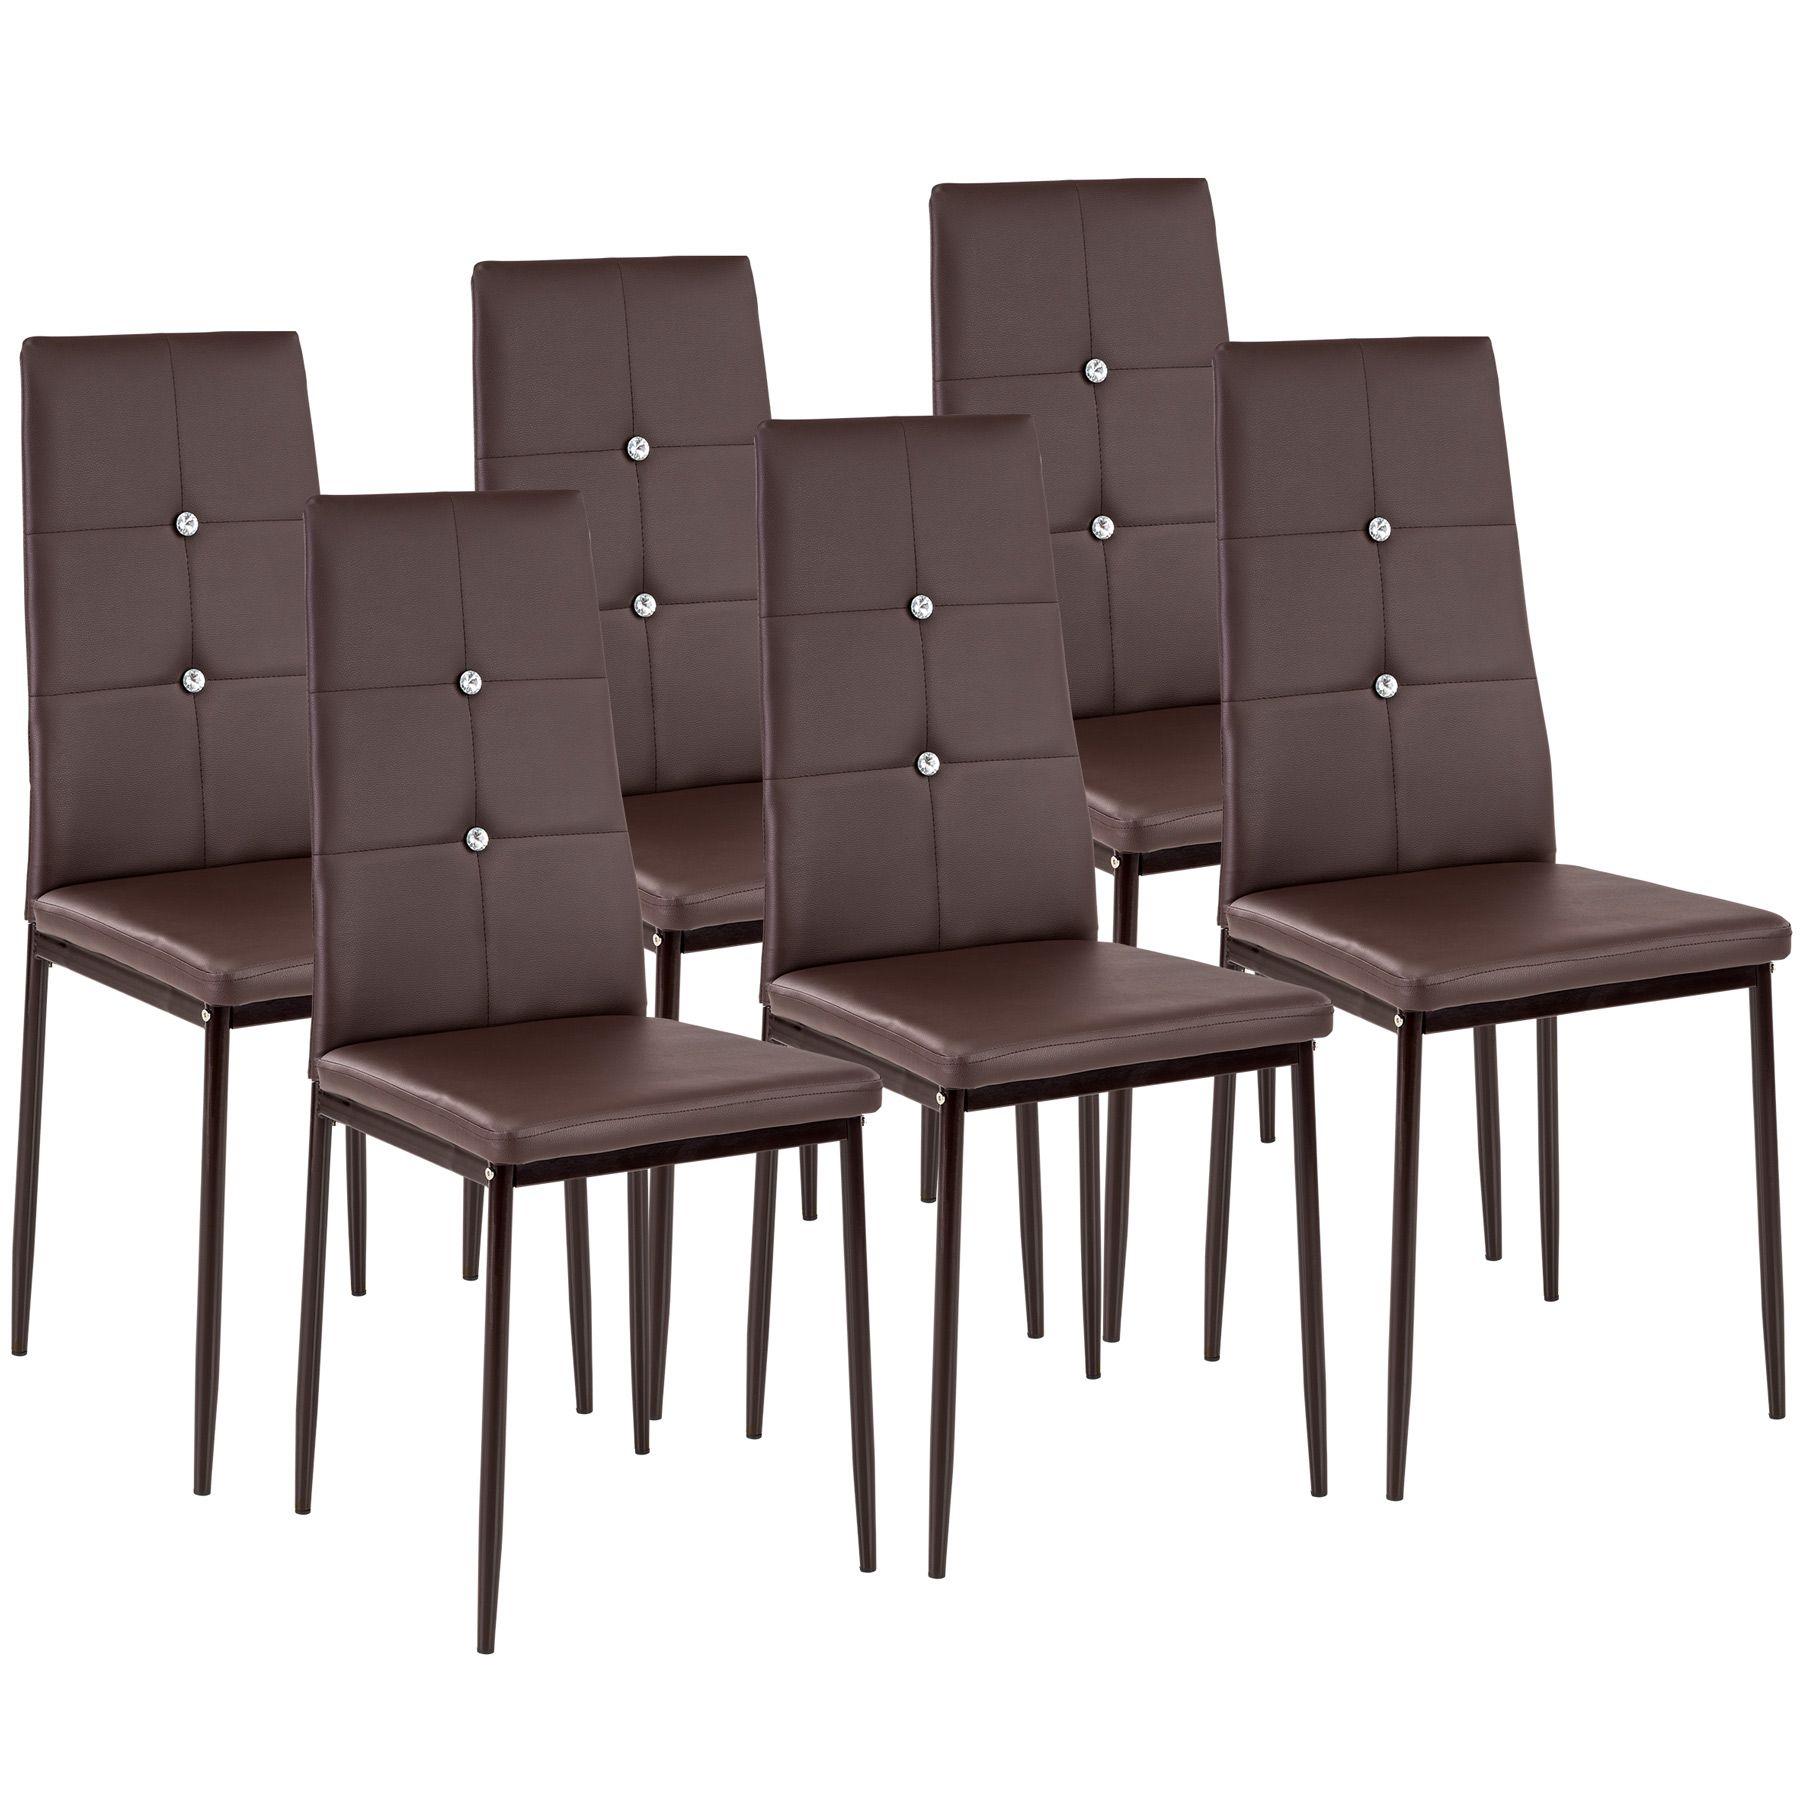 Set di 6 sedia per sala da pranzo tavolo cucina eleganti for Cucina con sala da pranzo